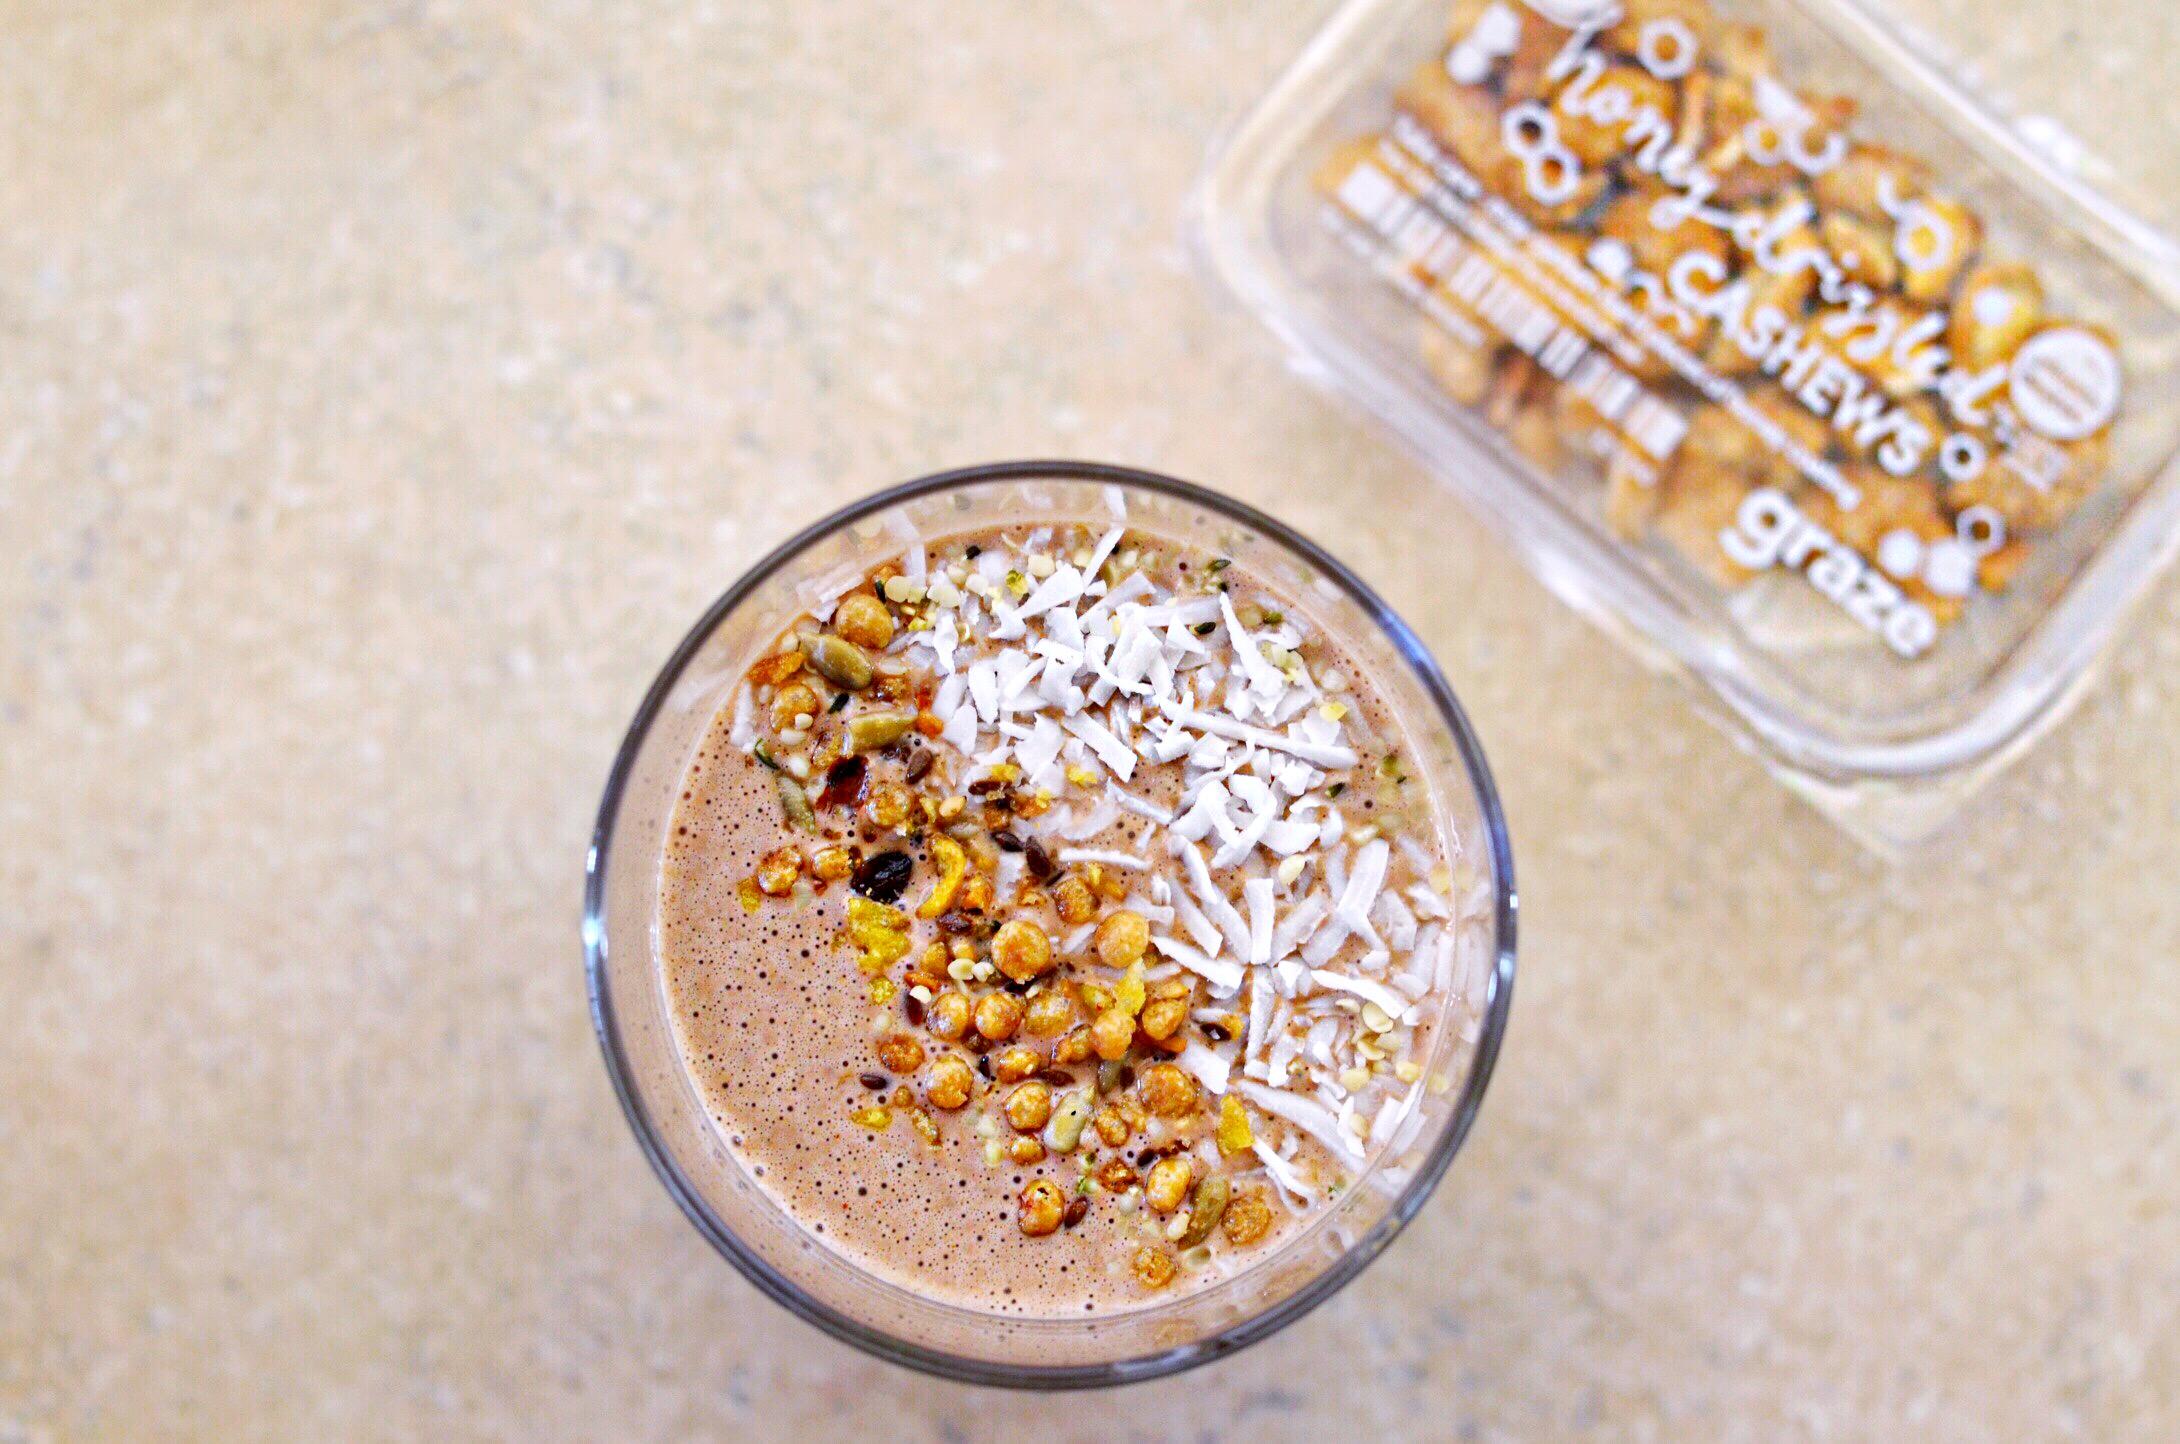 Cocoa + Almond Butter + Casher Milk + Oatmeal Shake